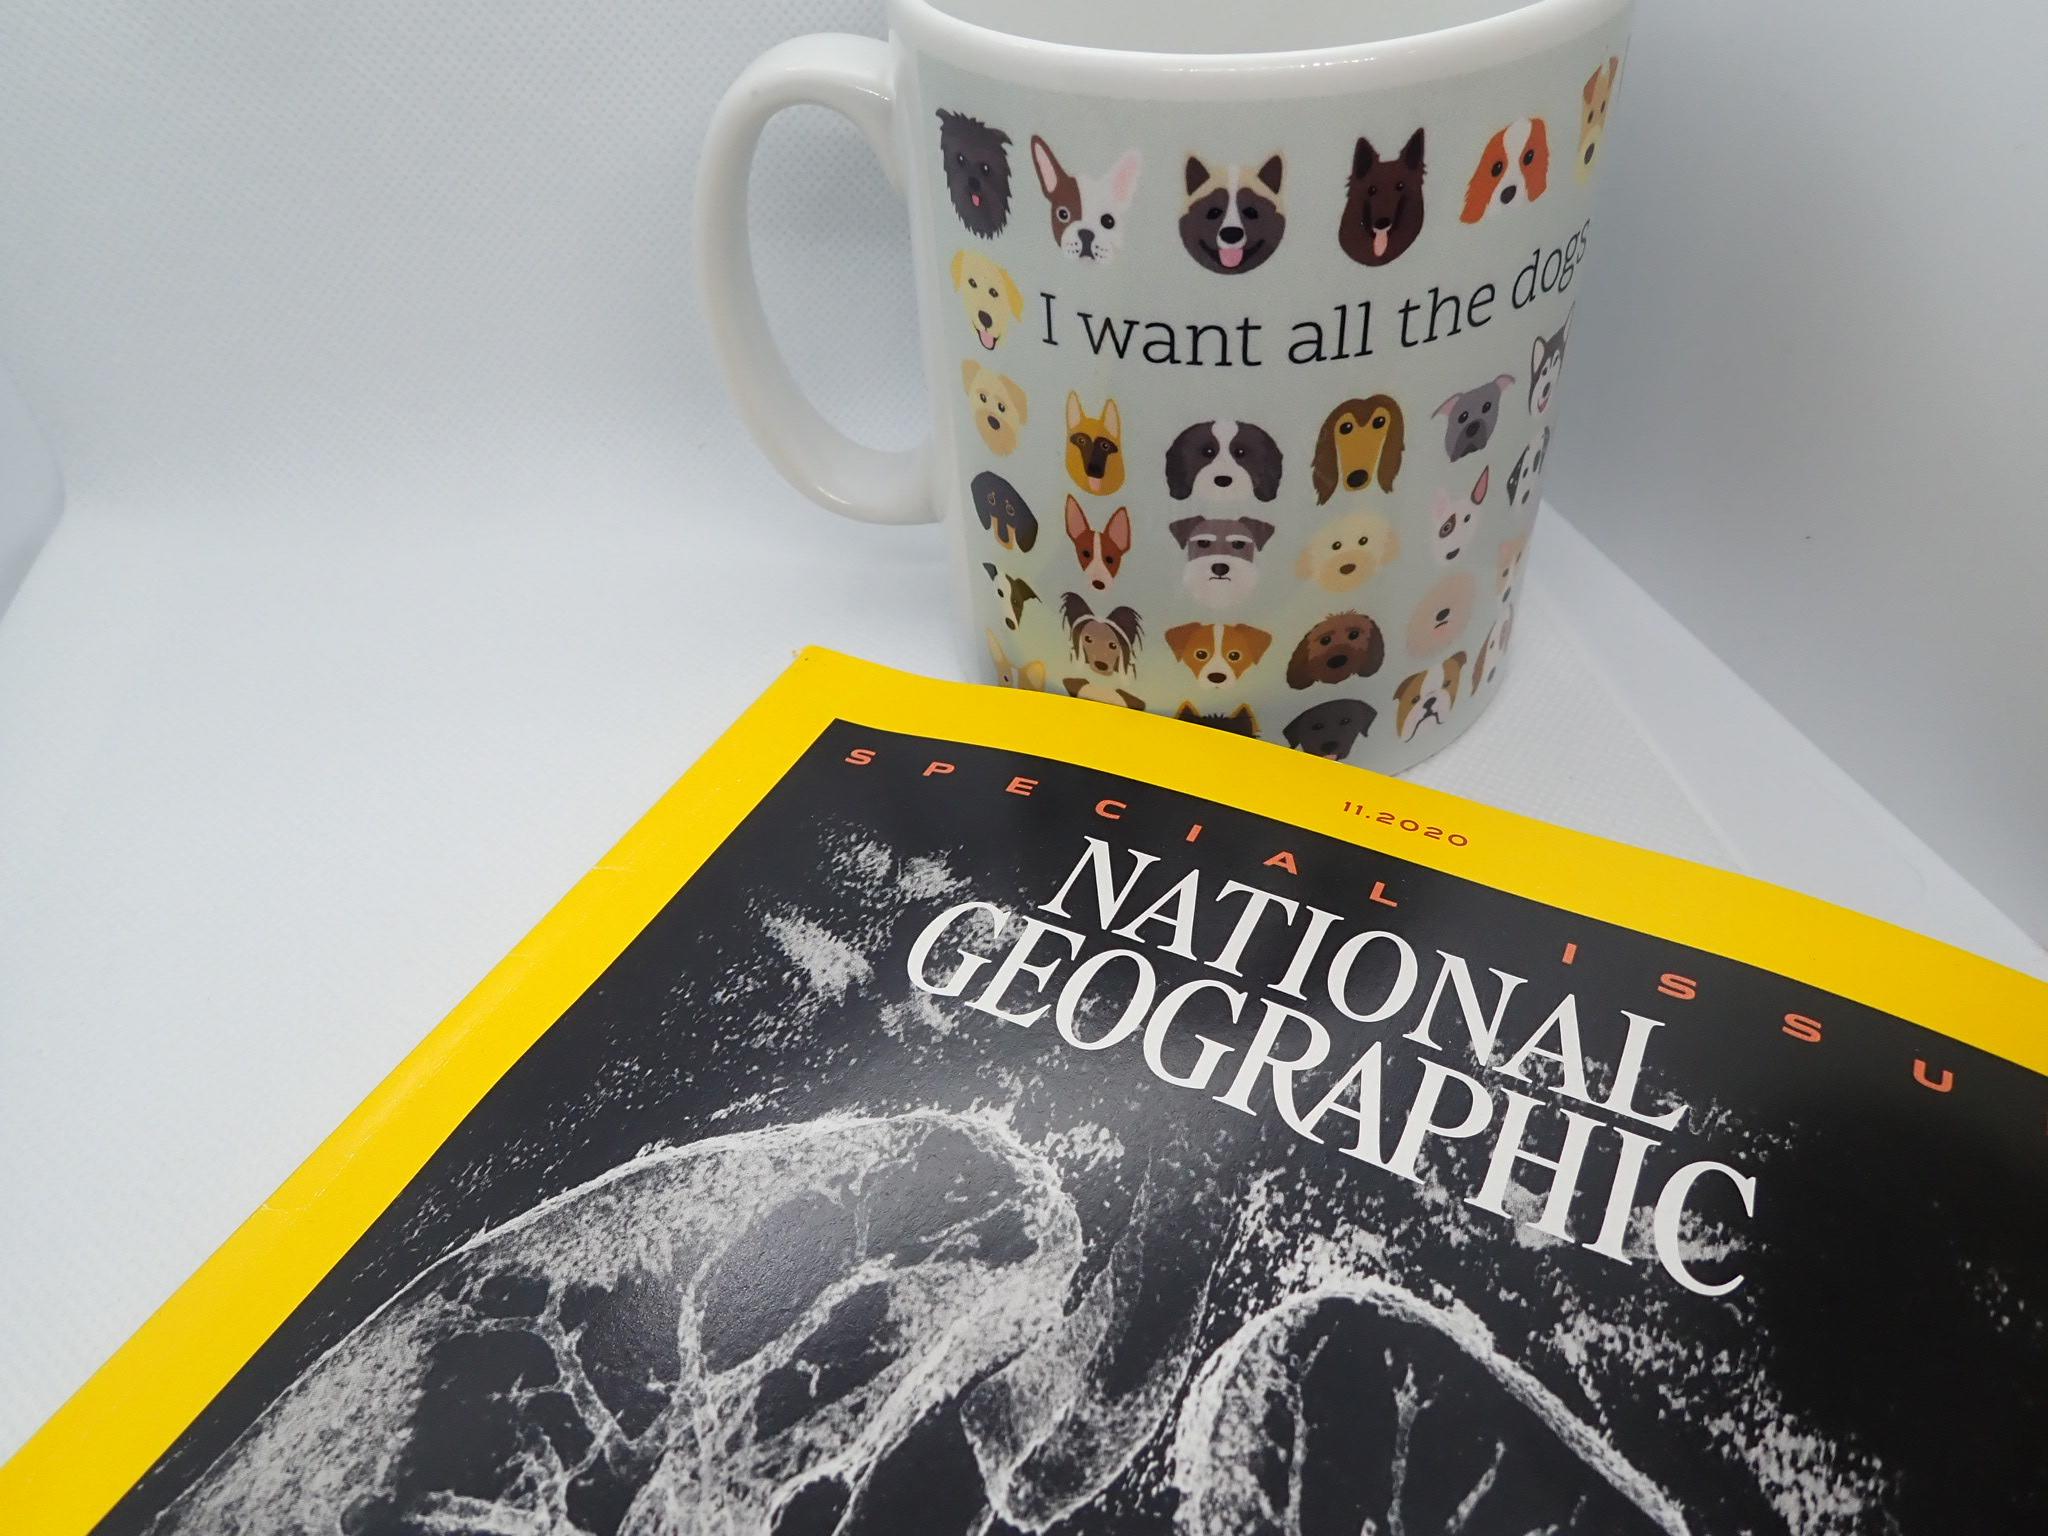 National Geographic next to mug